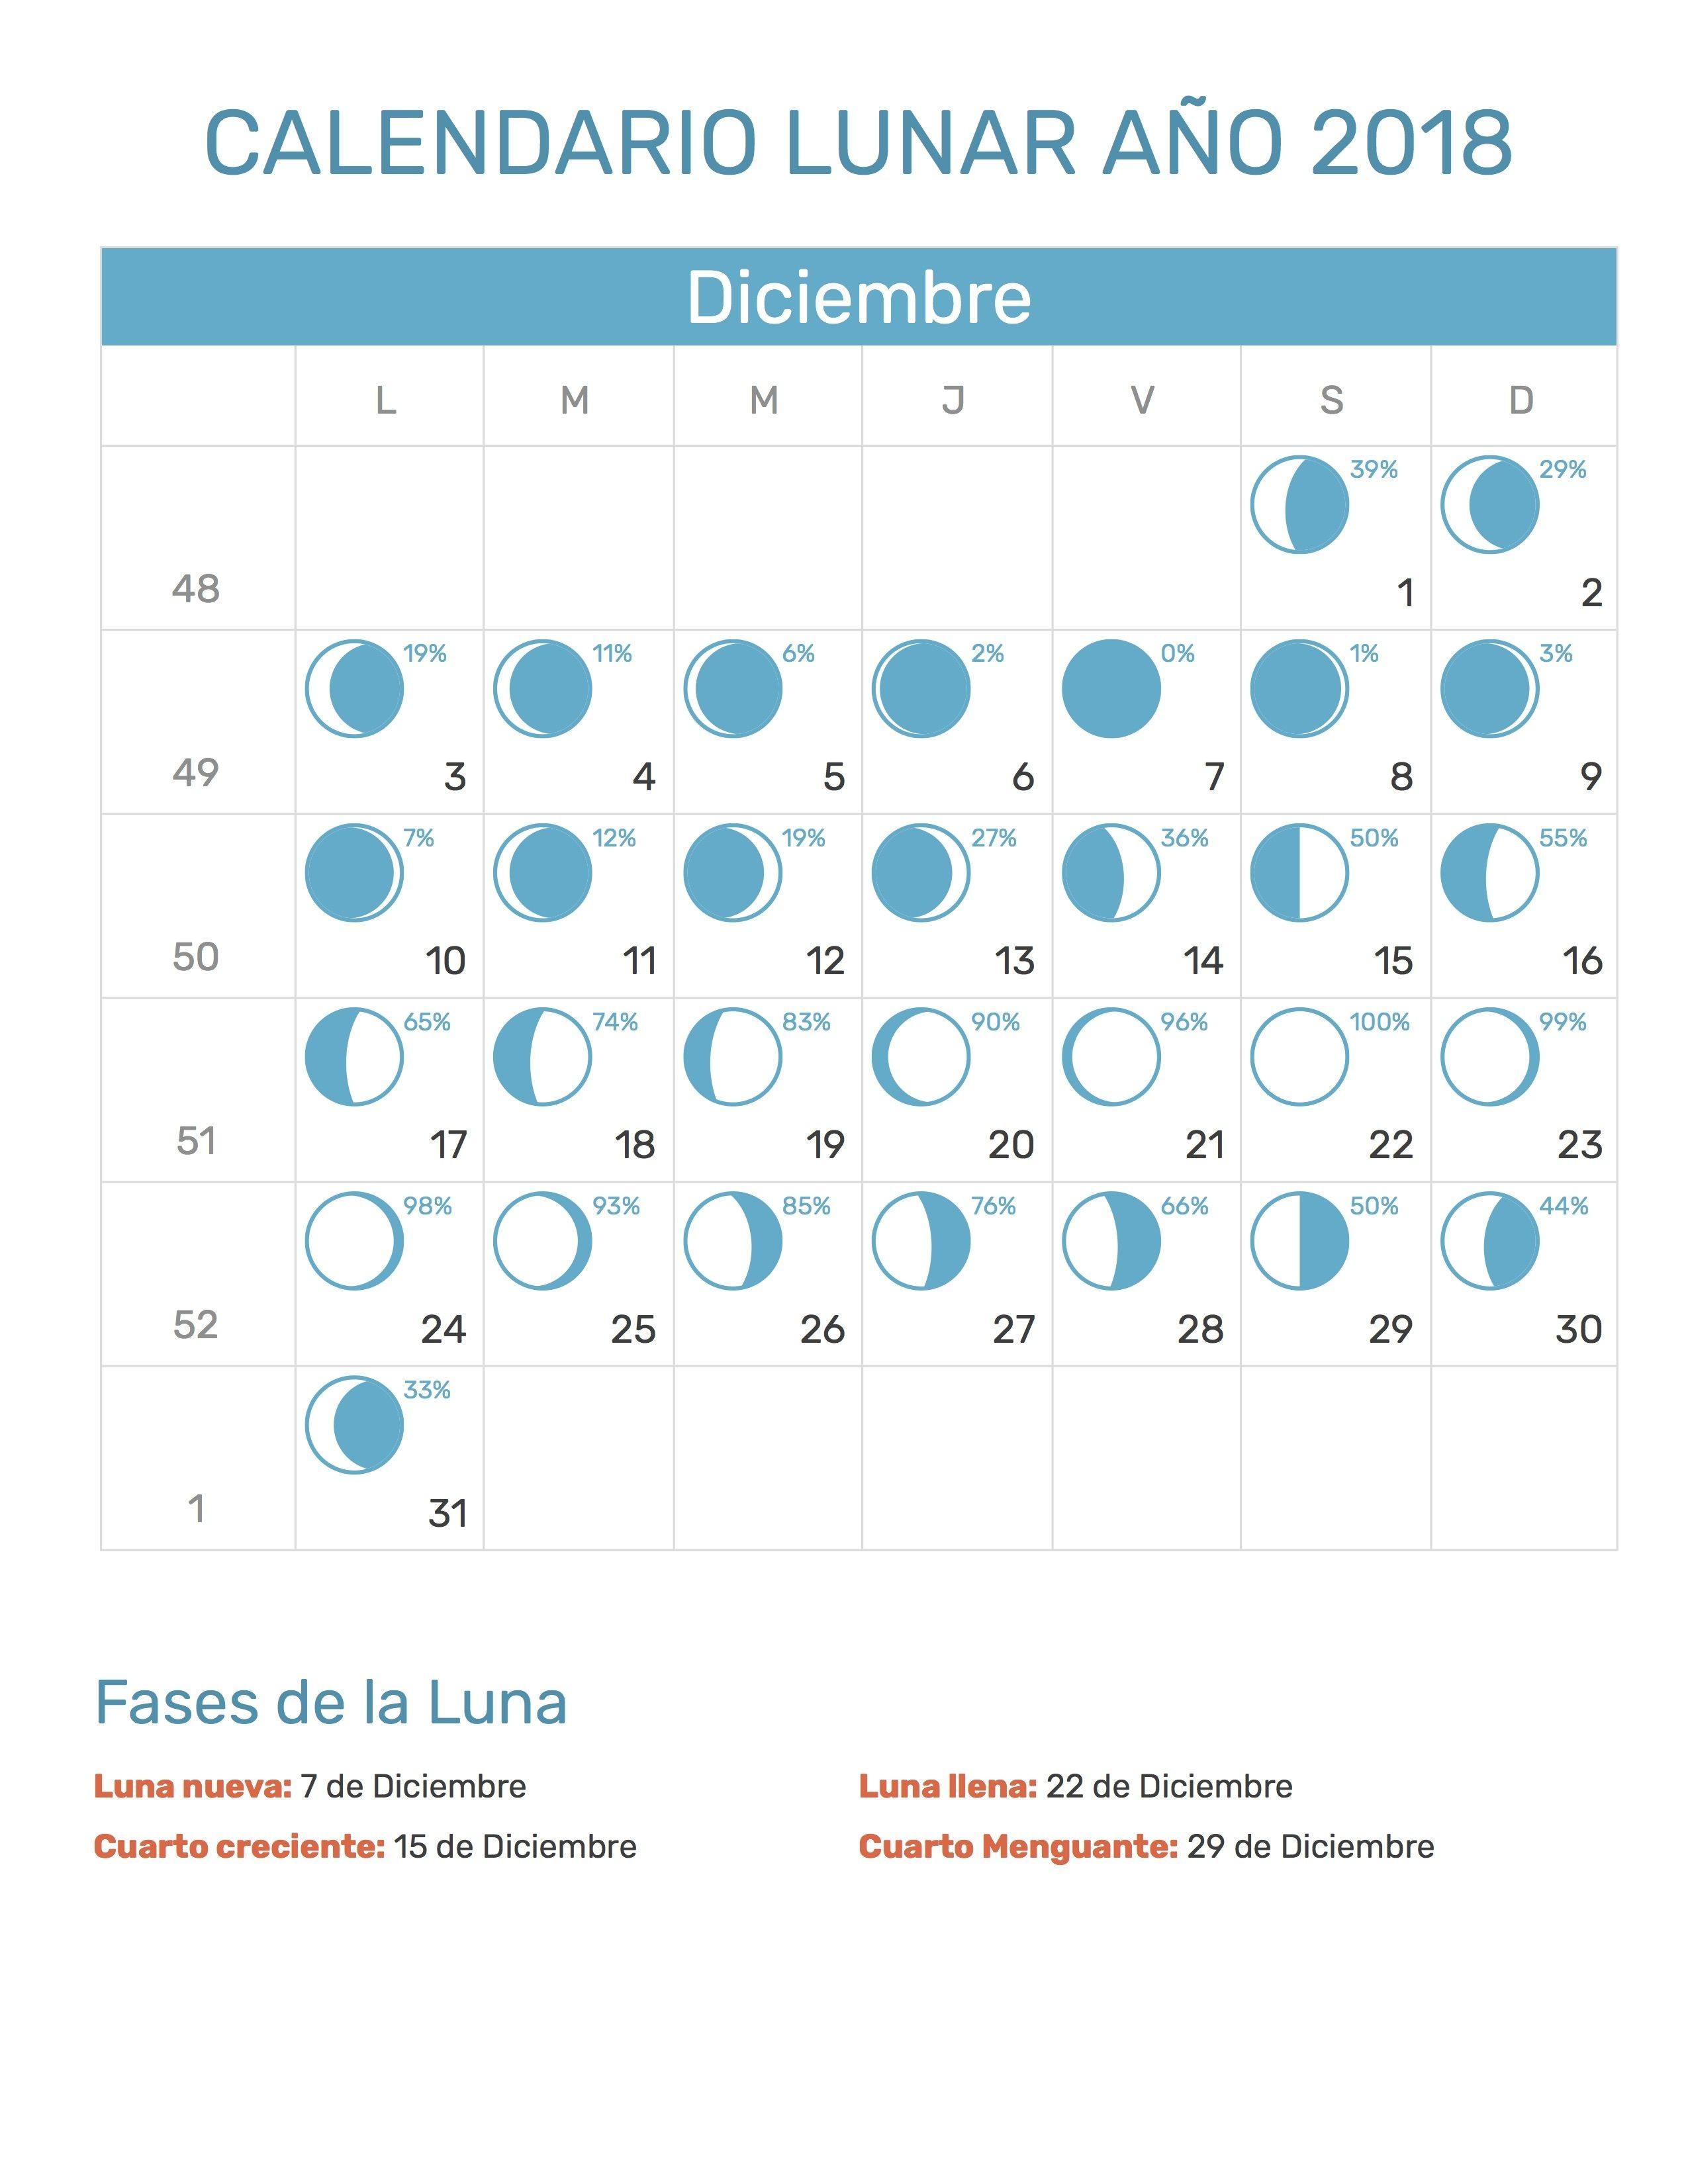 Calendario Imprimir 2017 Por Meses Mejores Y Más Novedosos Pin De Calendario Hispano En Calendario Lunar A±o 2018 Of Calendario Imprimir 2017 Por Meses Más Reciente Melani Melashi161 On Pinterest